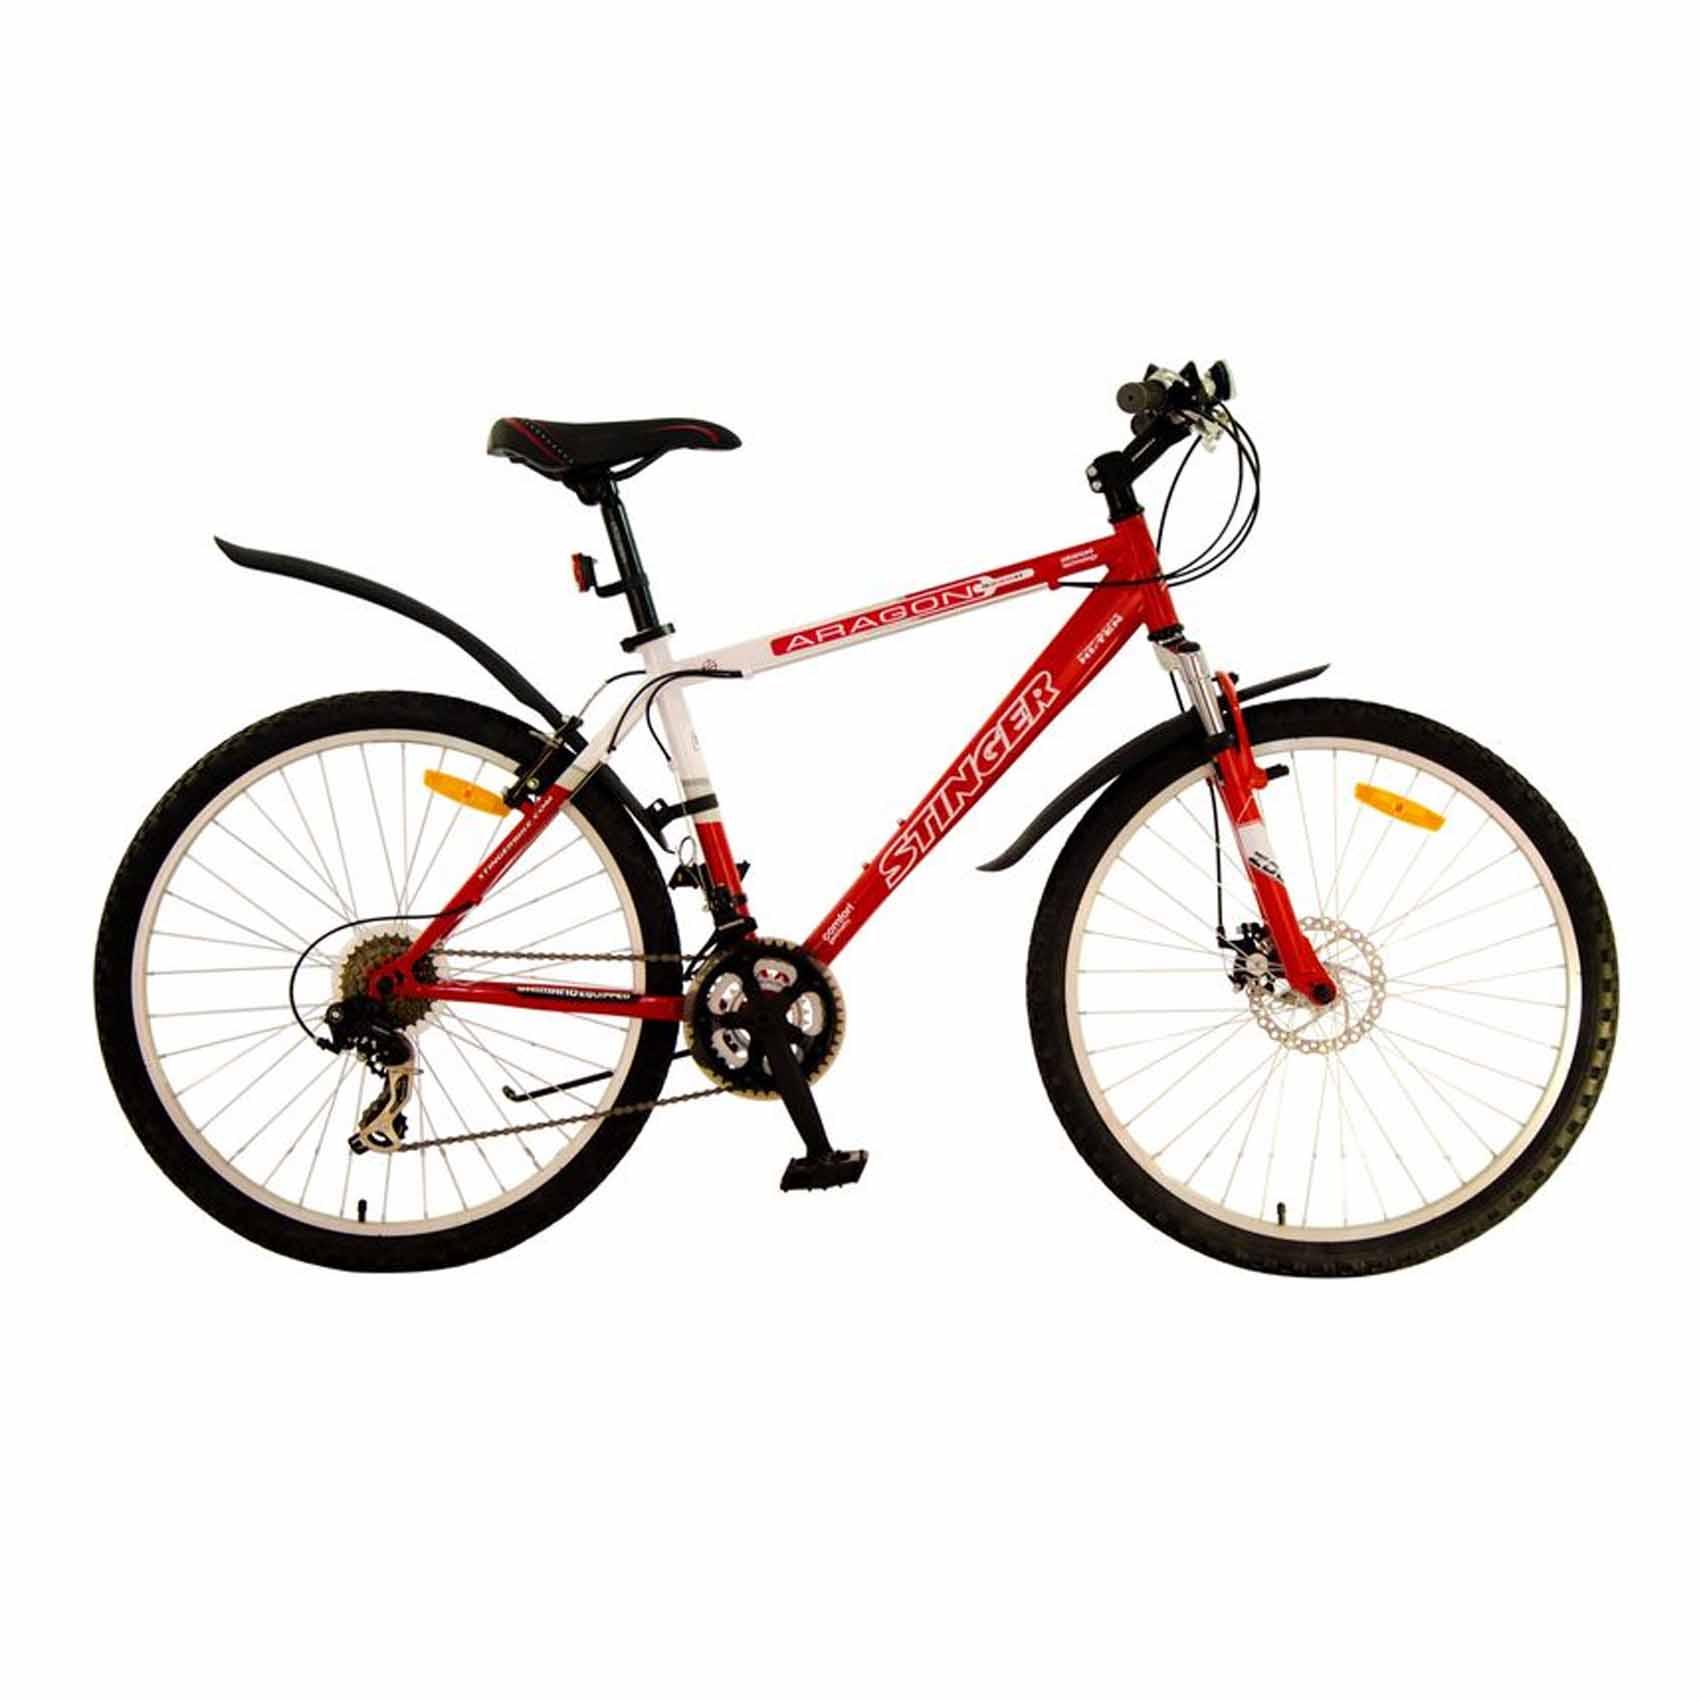 "Велосипед Stinger 26"" Х43961 Арагон S270D хардт. 21ск. рама 18д. красно-белый"